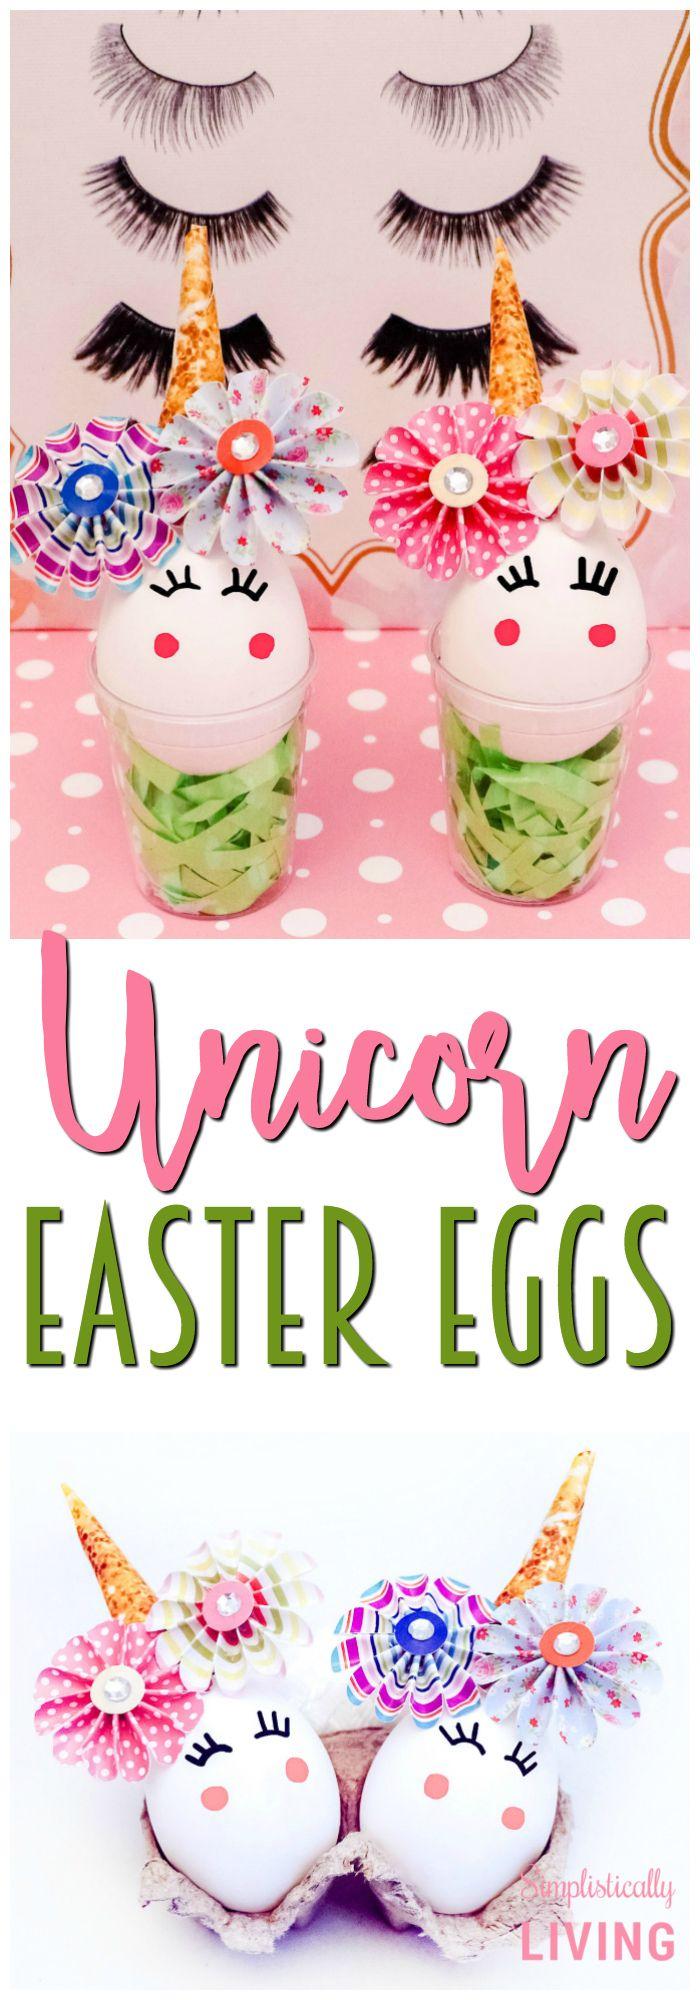 Unicorn Easter Eggs #unicorn #eastereggs #unicorneggs #unicornparty #unicorncrafts